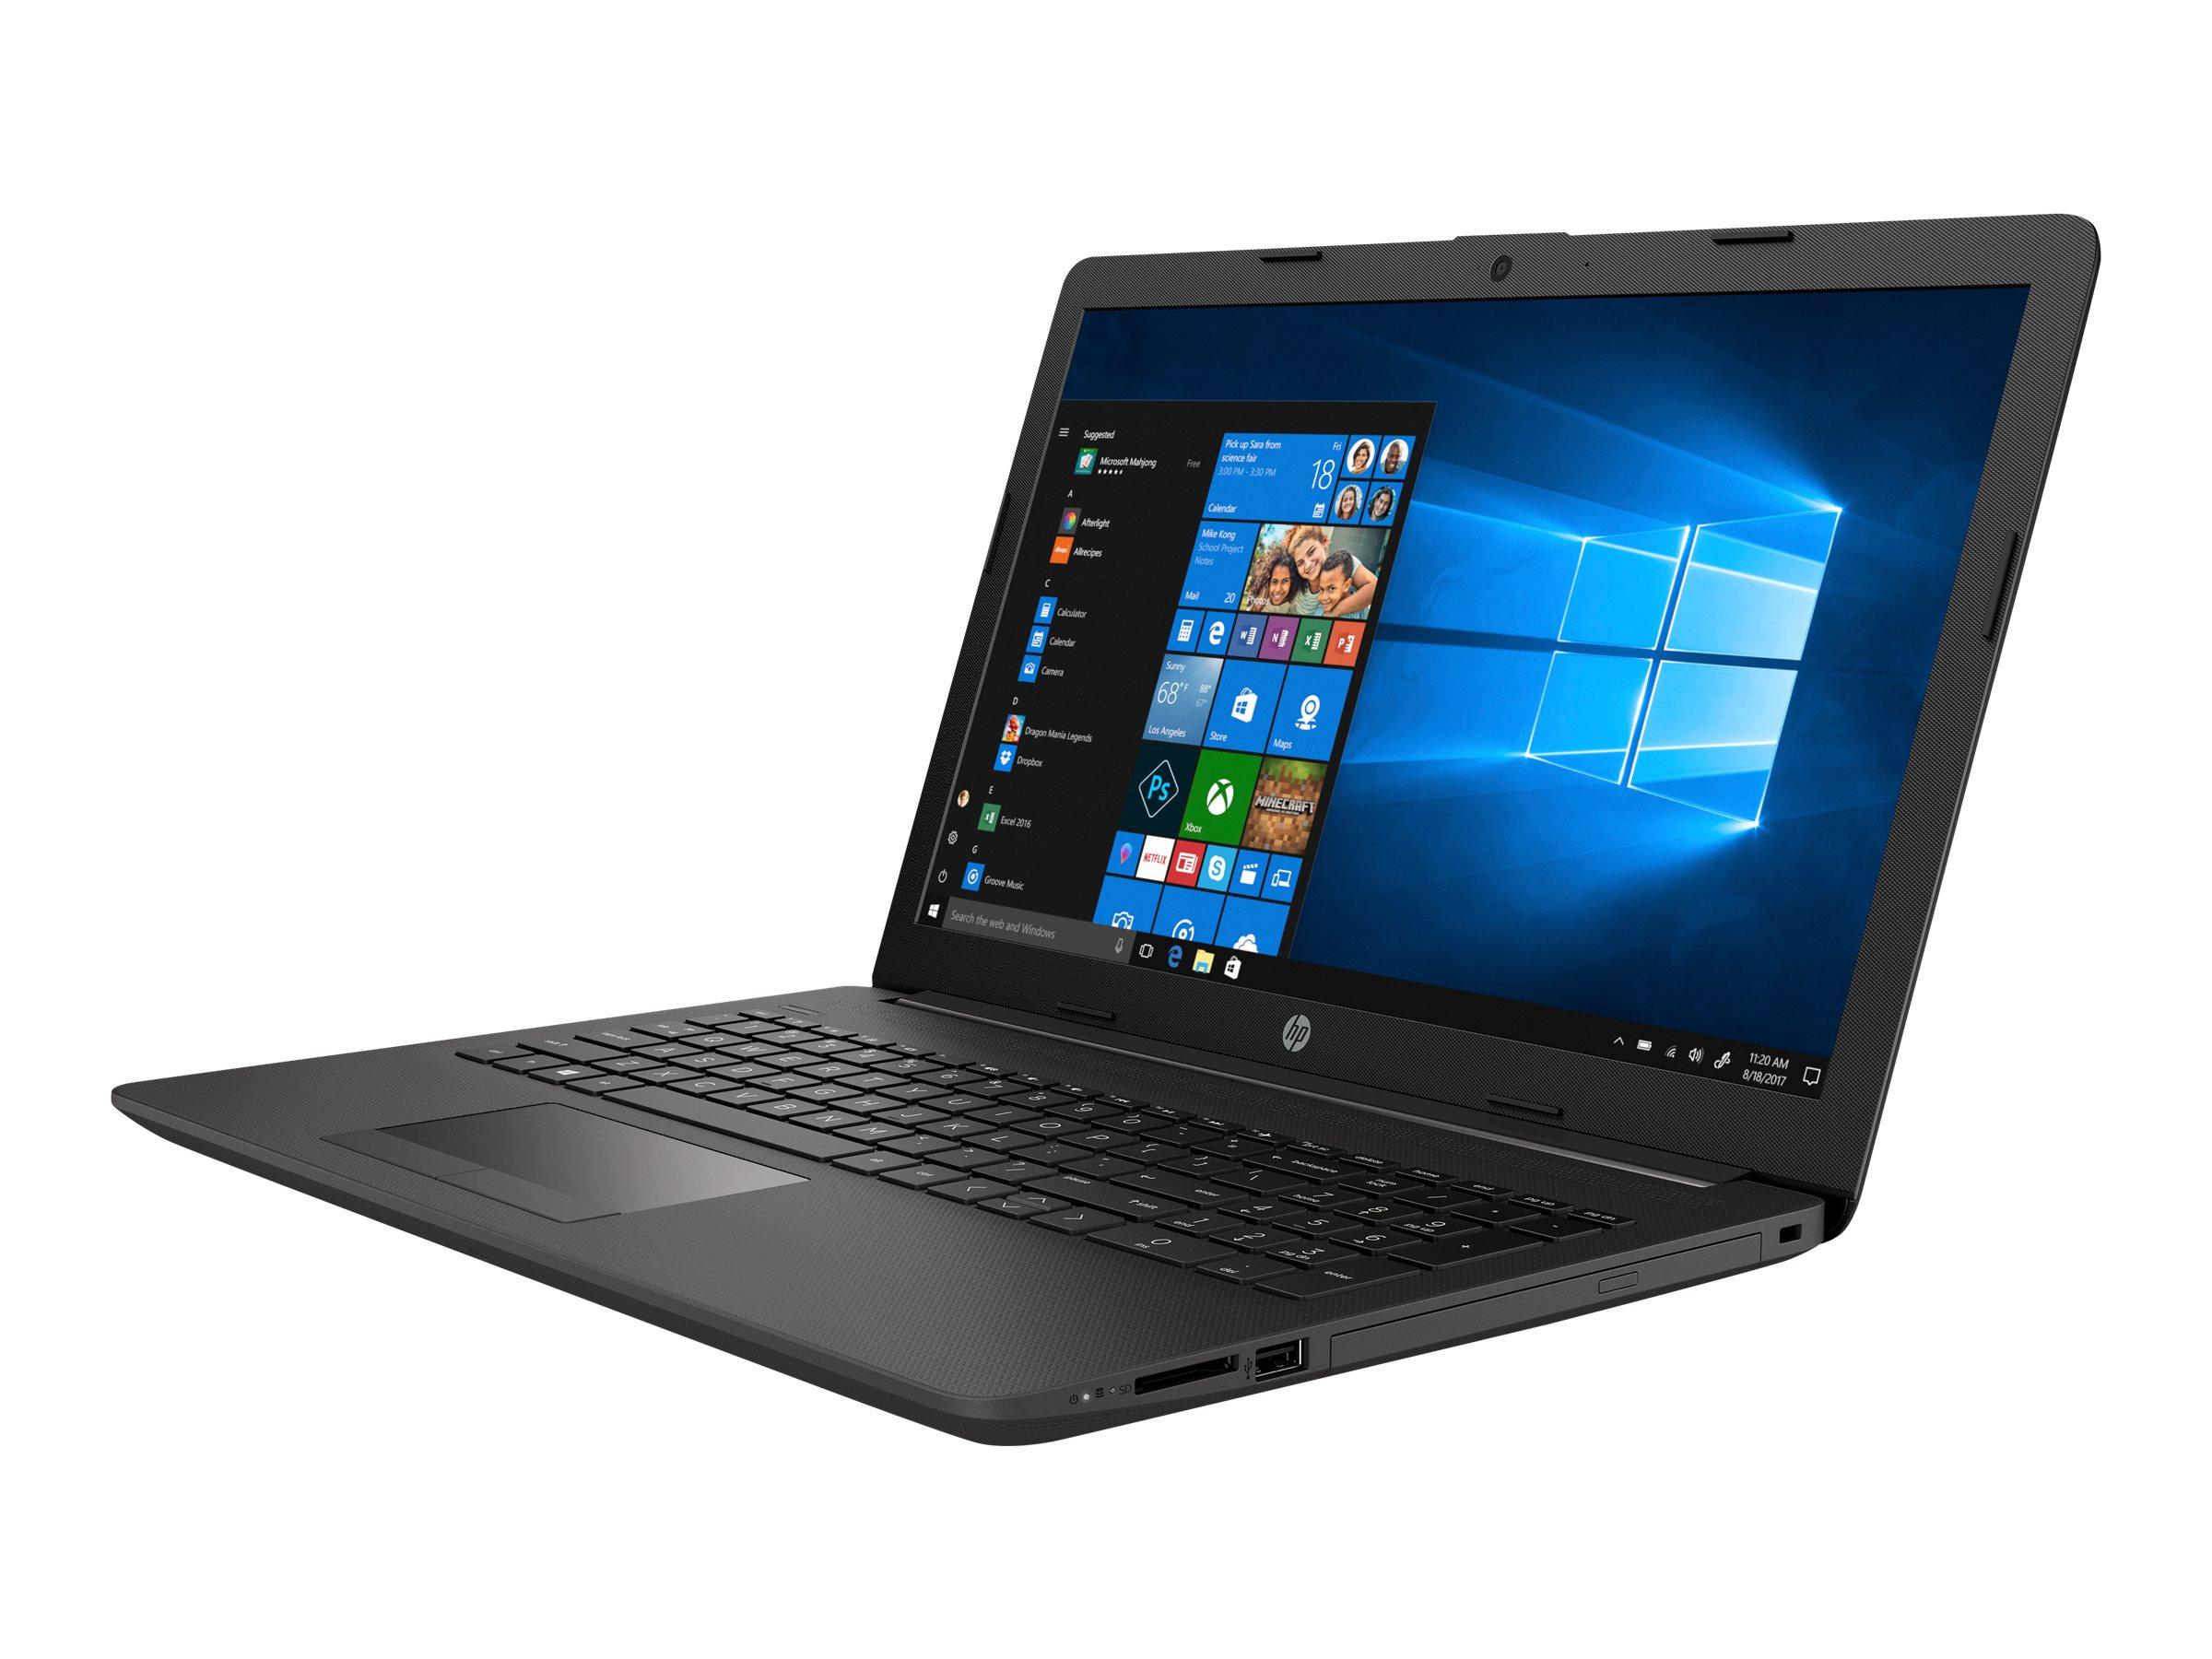 "Vorschau: HP 255 G7 - Ryzen 5 3500U / 2.1 GHz - Win 10 Pro 64-Bit - 8 GB RAM - 256 GB SSD NVMe - DVD-Writer - 39.6 cm (15.6"")"